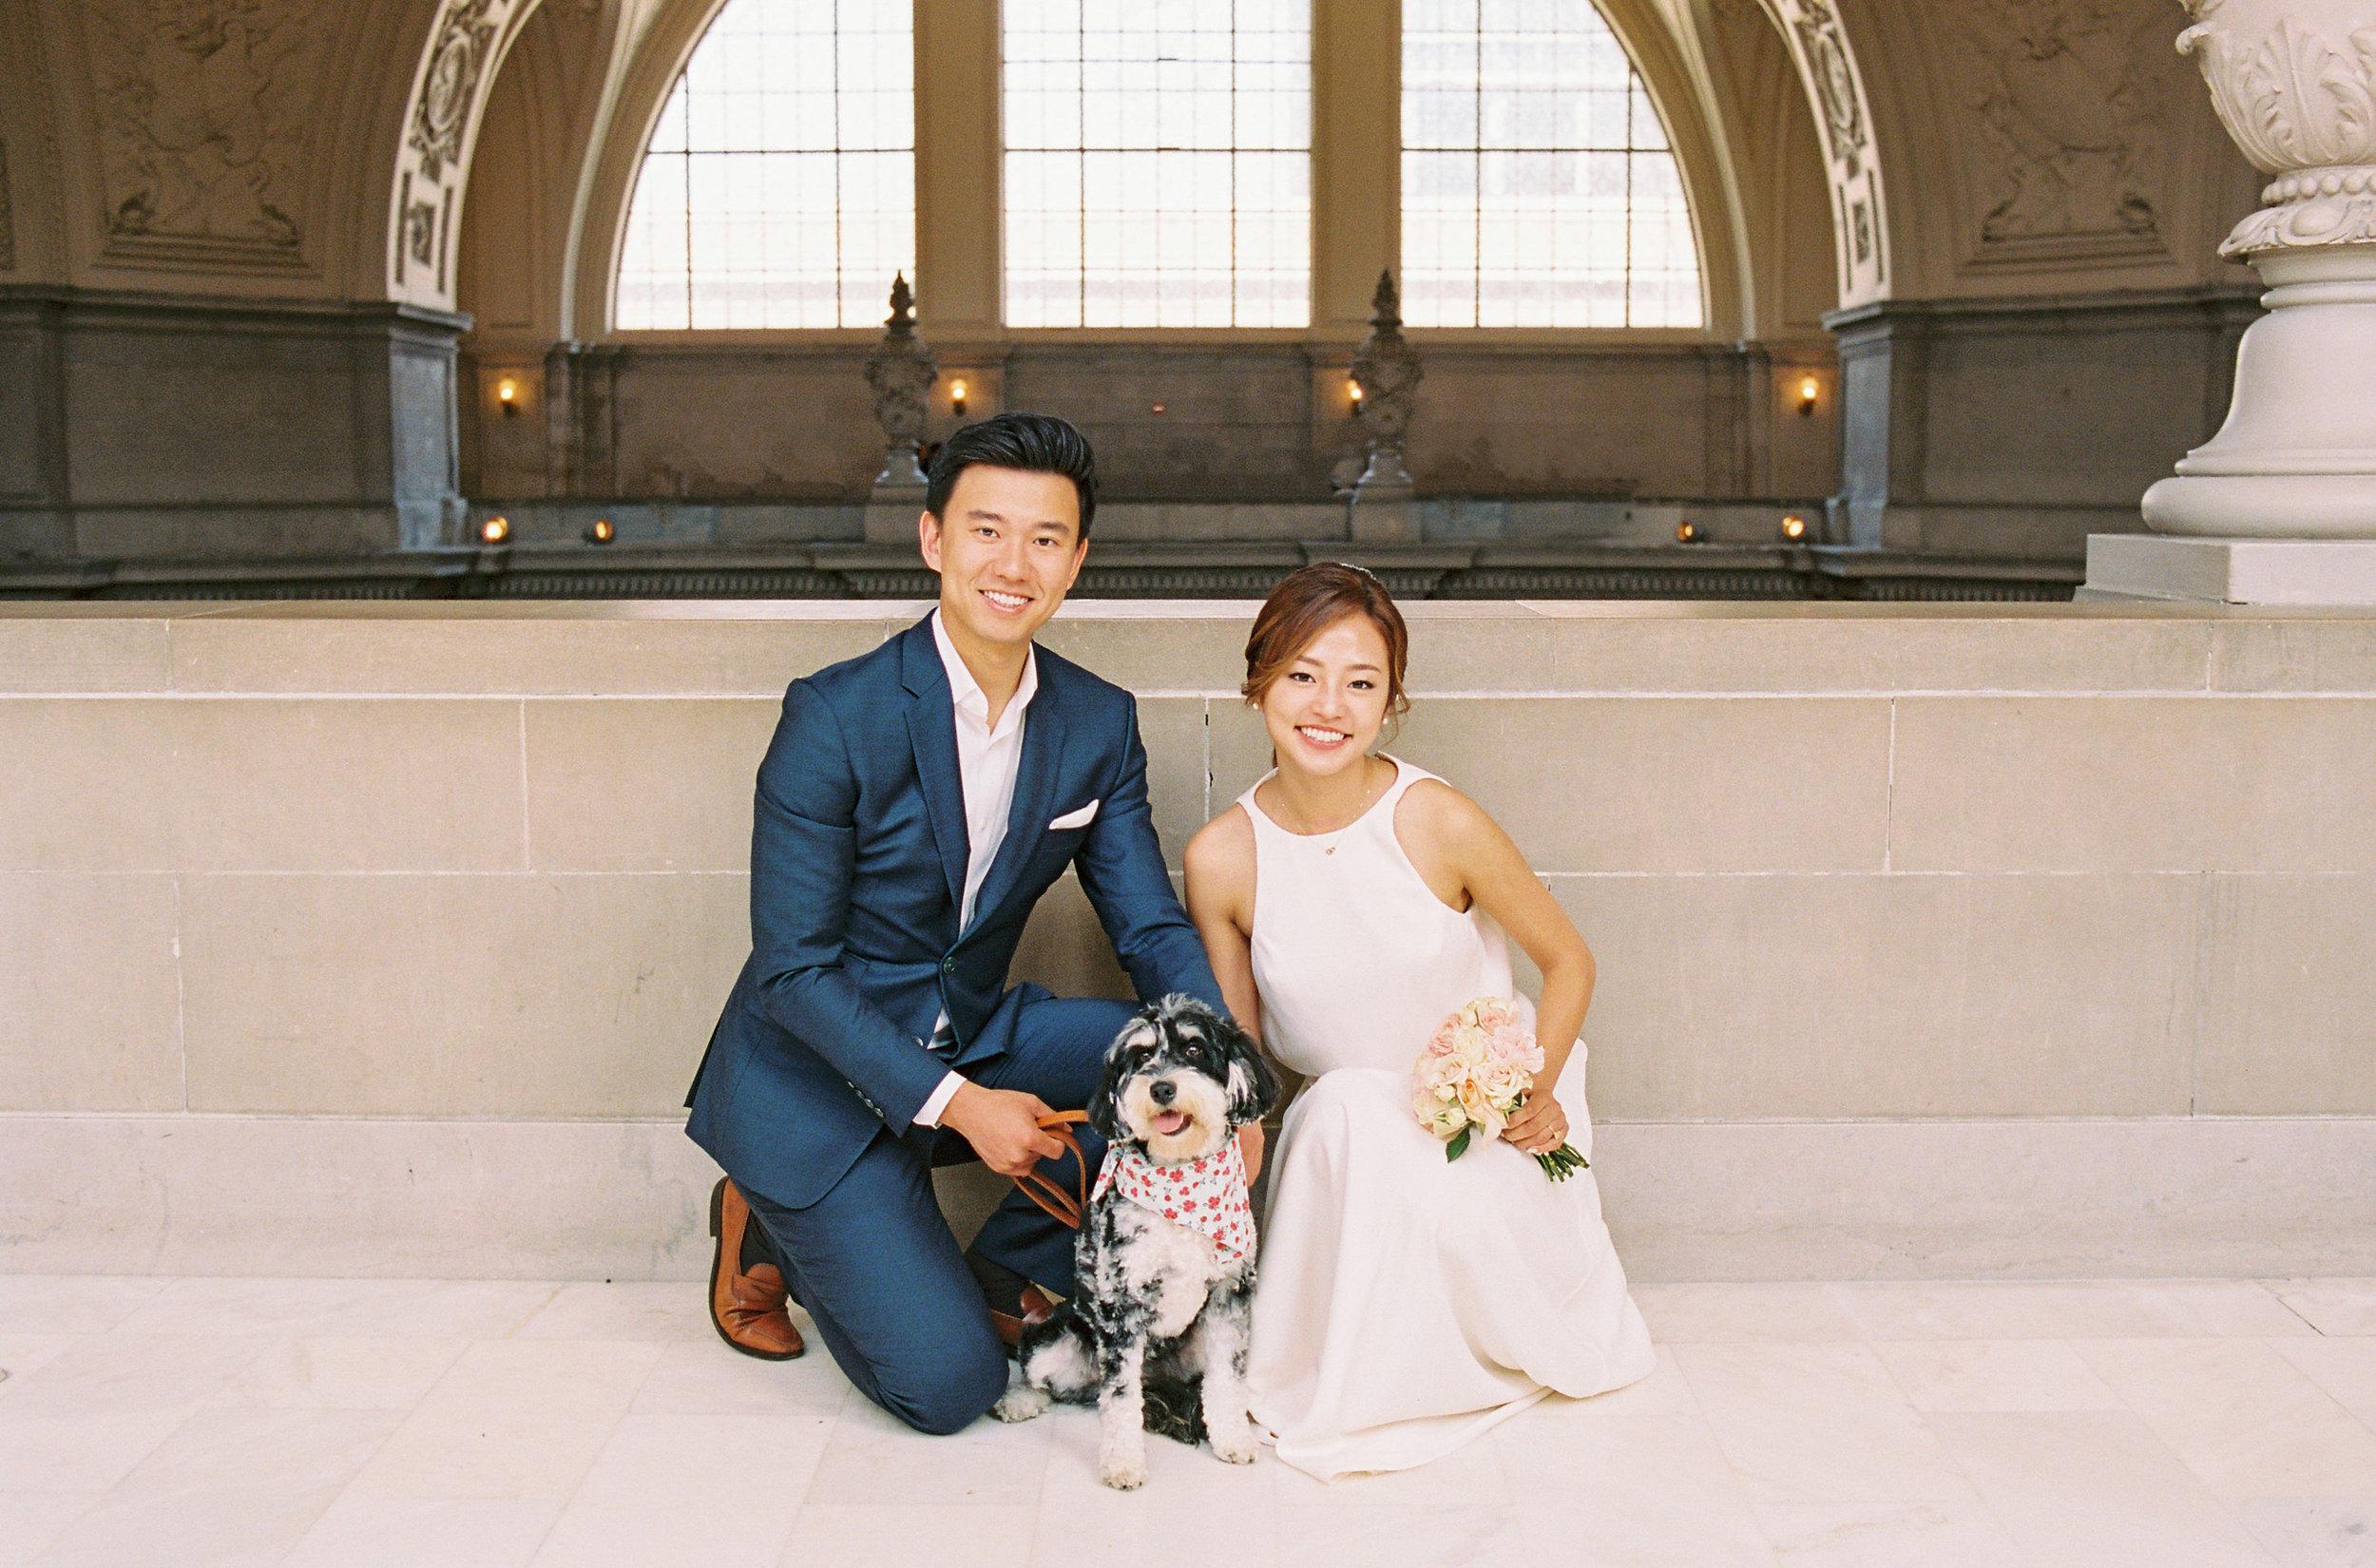 San-francisco-city-hall-photography-wedding-053.jpg